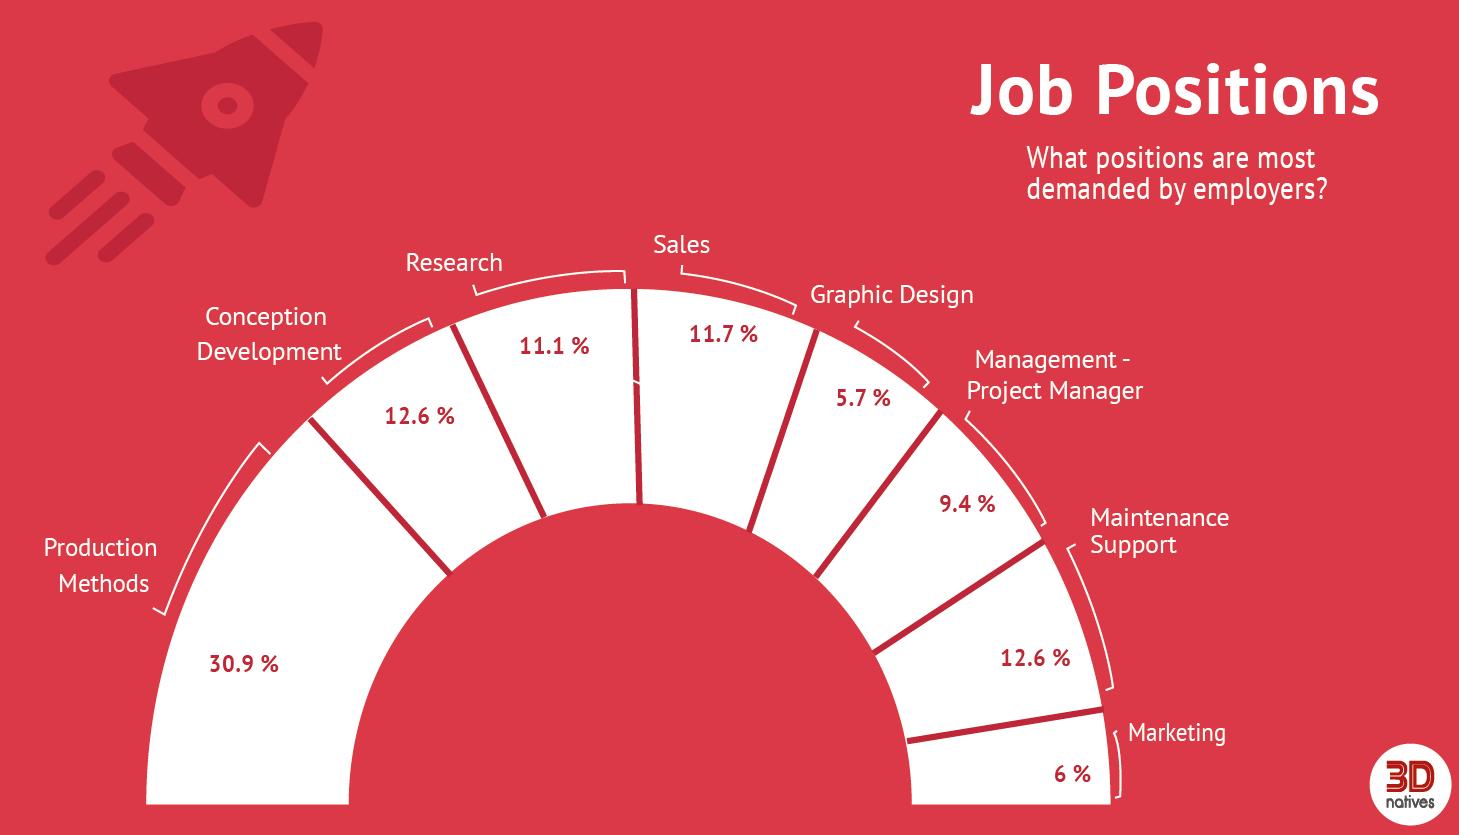 3D Printing Job Market